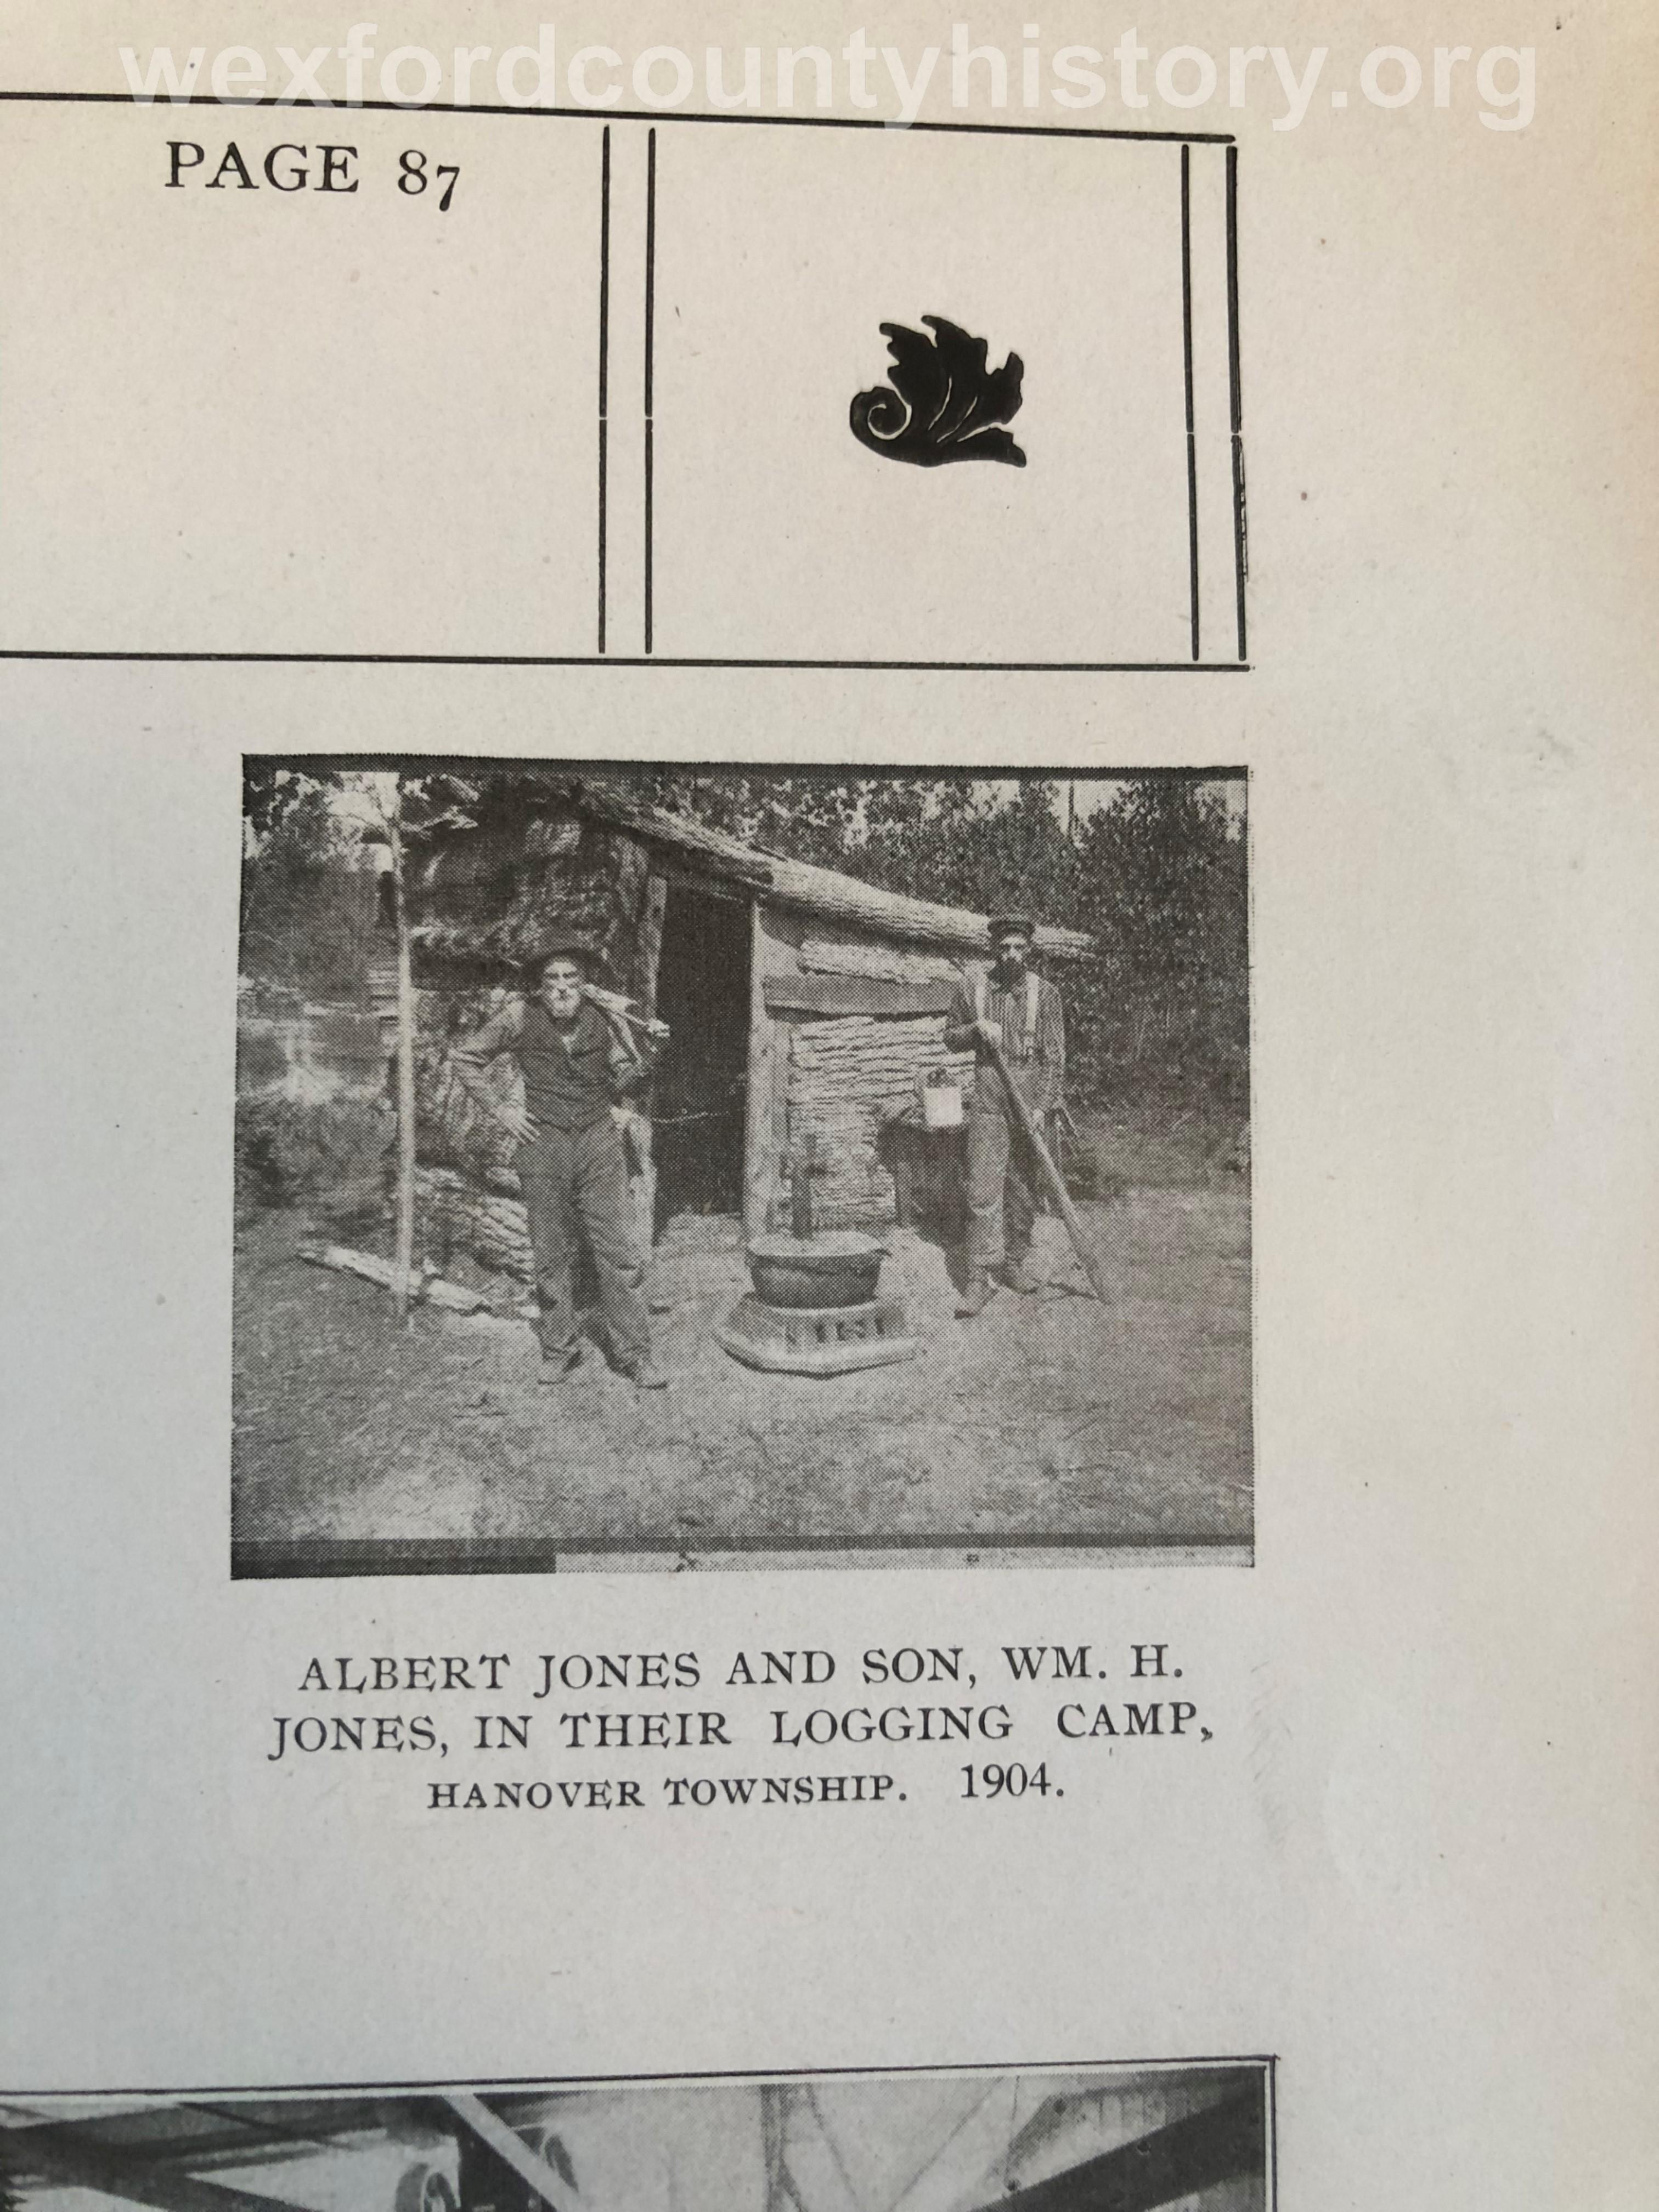 Wexford-County-Lumber-Albert-Jones-And-William-H-Jones-In-Their-Logging-Camp-1904